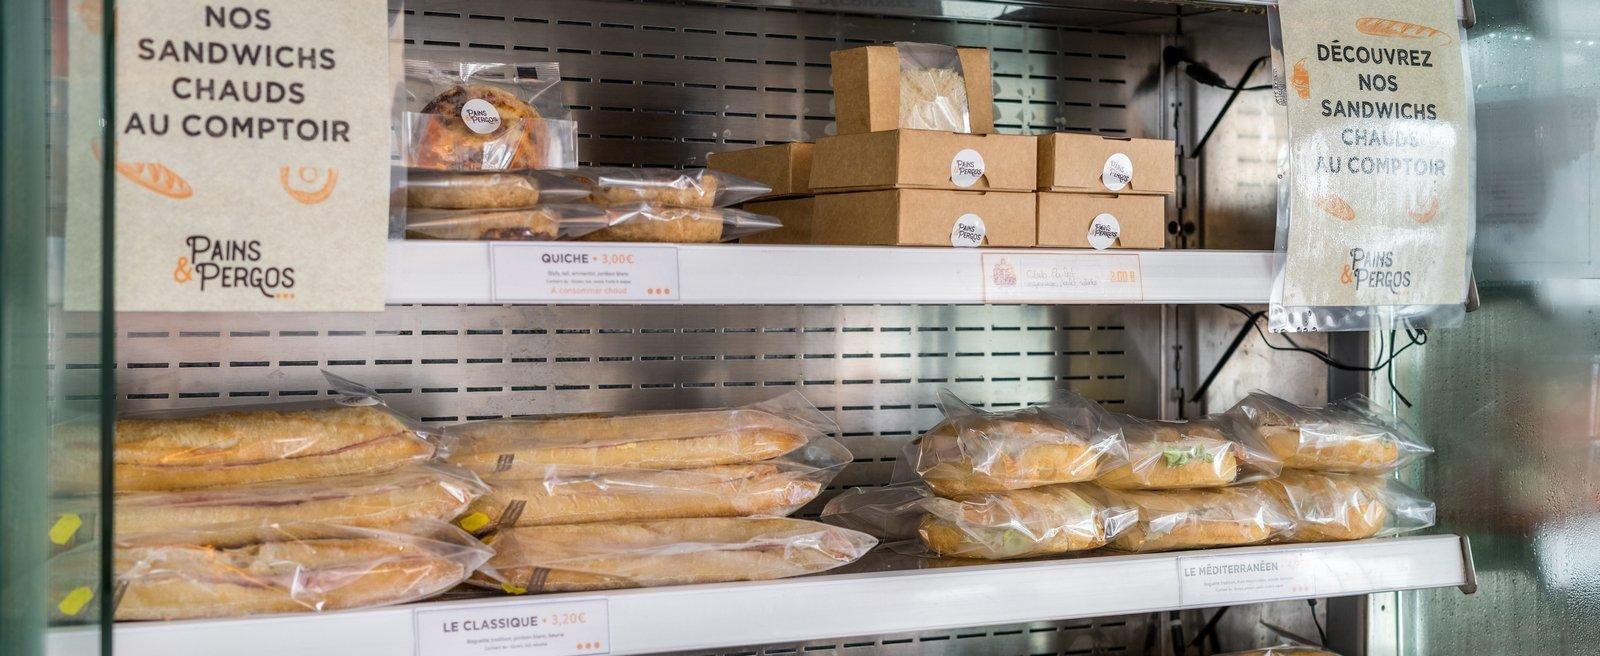 Snack Pains & Pergo - Nailloux Outlet Village